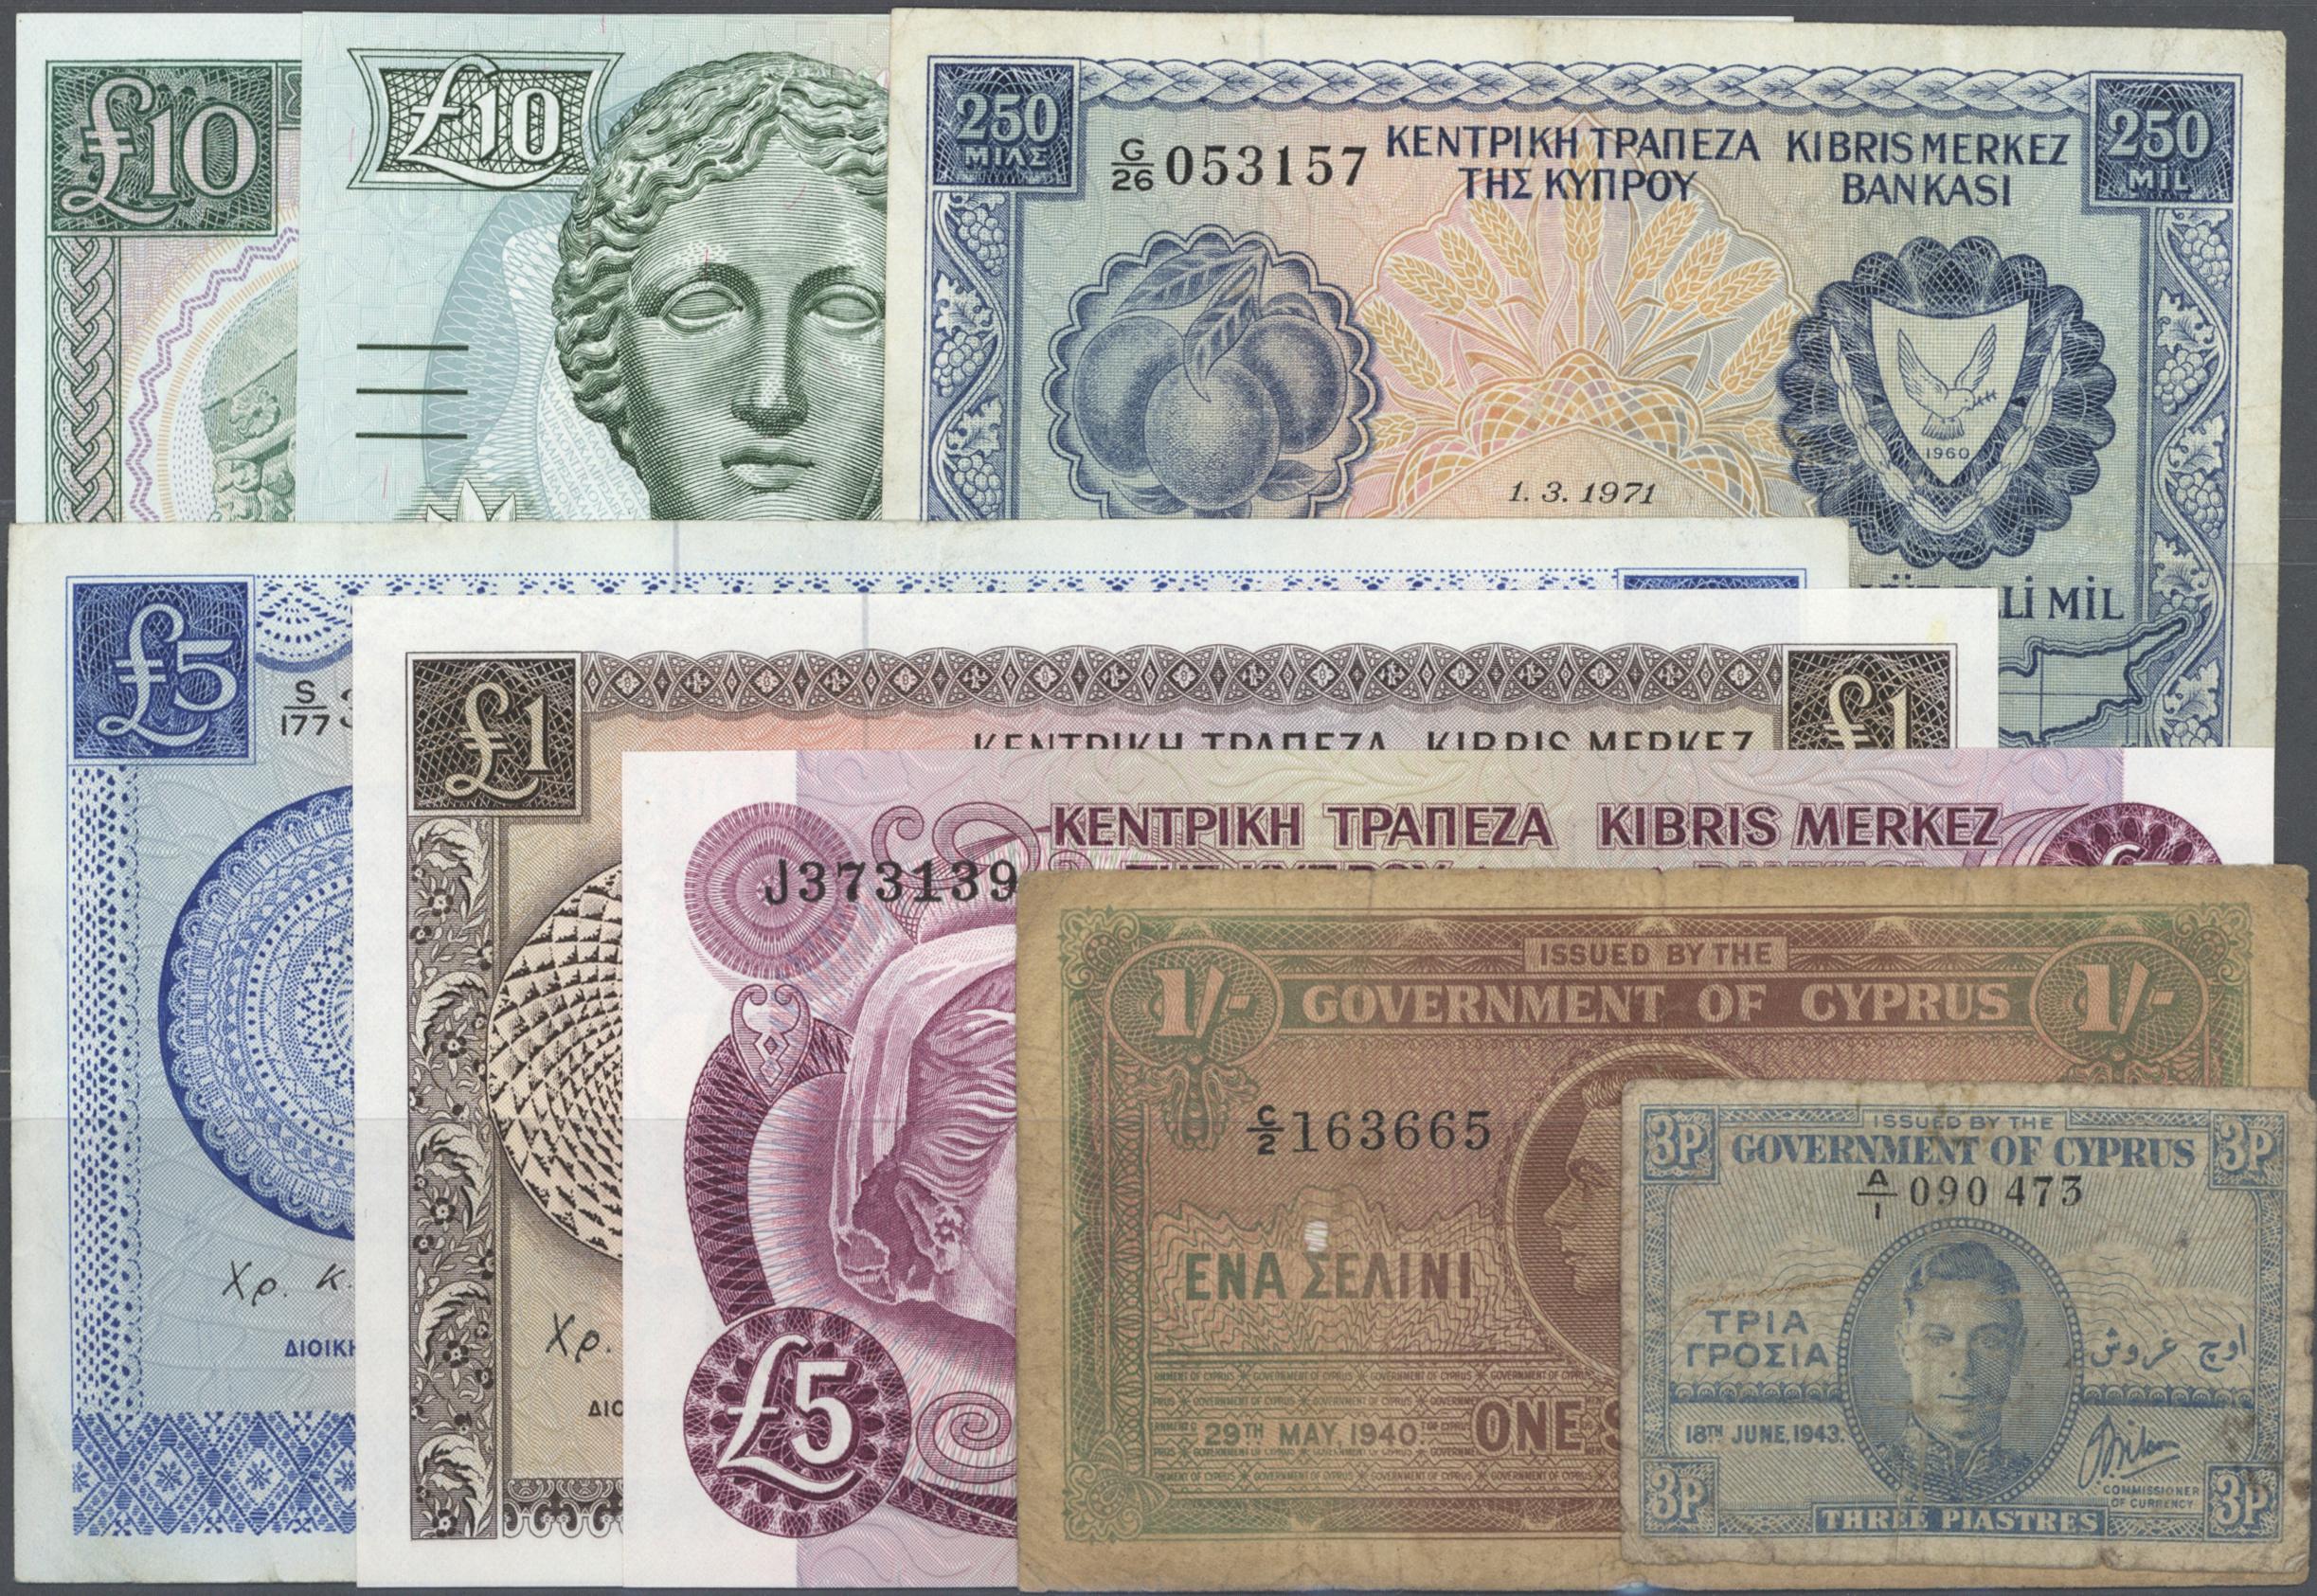 Lot 00370 - Cyprus / Zypern   Banknoten  -  Auktionshaus Christoph Gärtner GmbH & Co. KG 51th Auction - Day 1